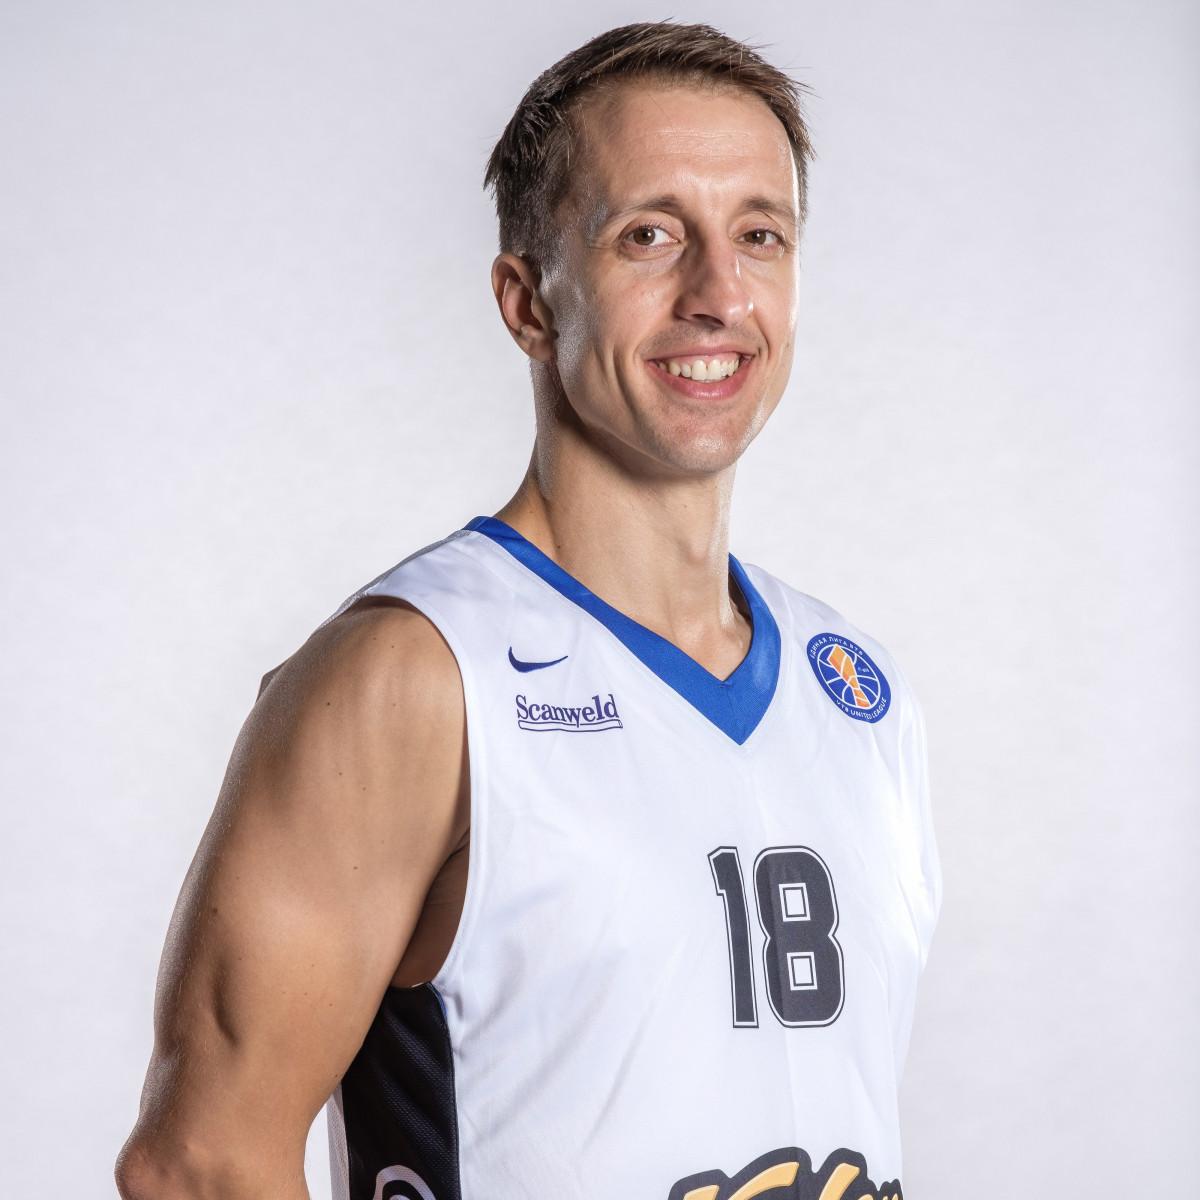 Photo of Branko Mirkovic, 2018-2019 season